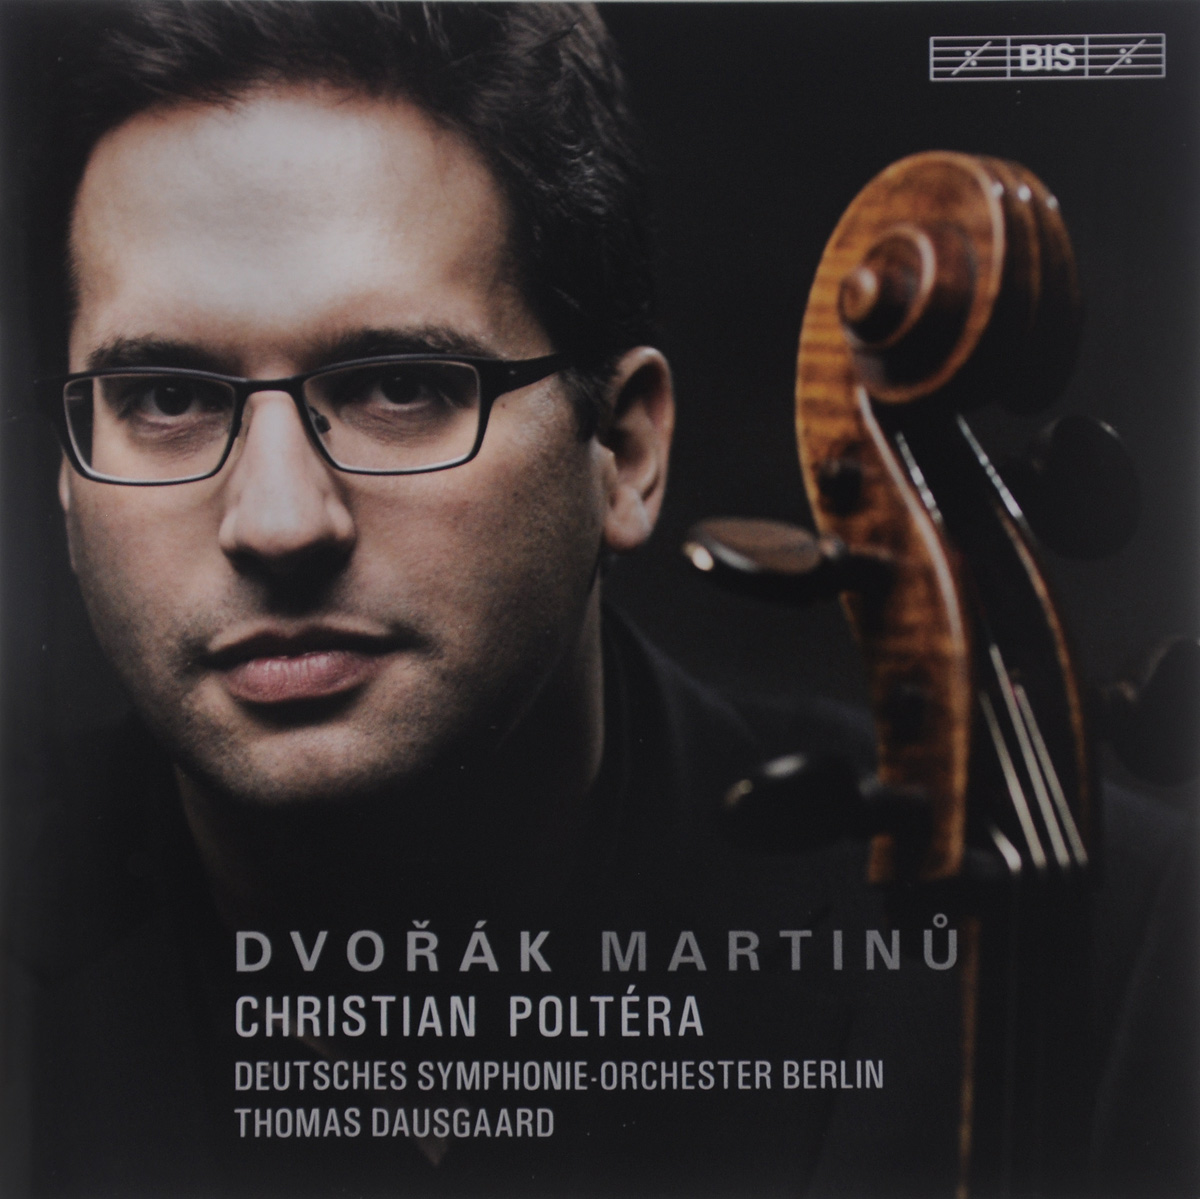 Thomas Dausgaard. Dvorak / Martinu. Cello Concertos (SACD). Томас Даусгард,Deutsches Symphonie-Orchester Berlin